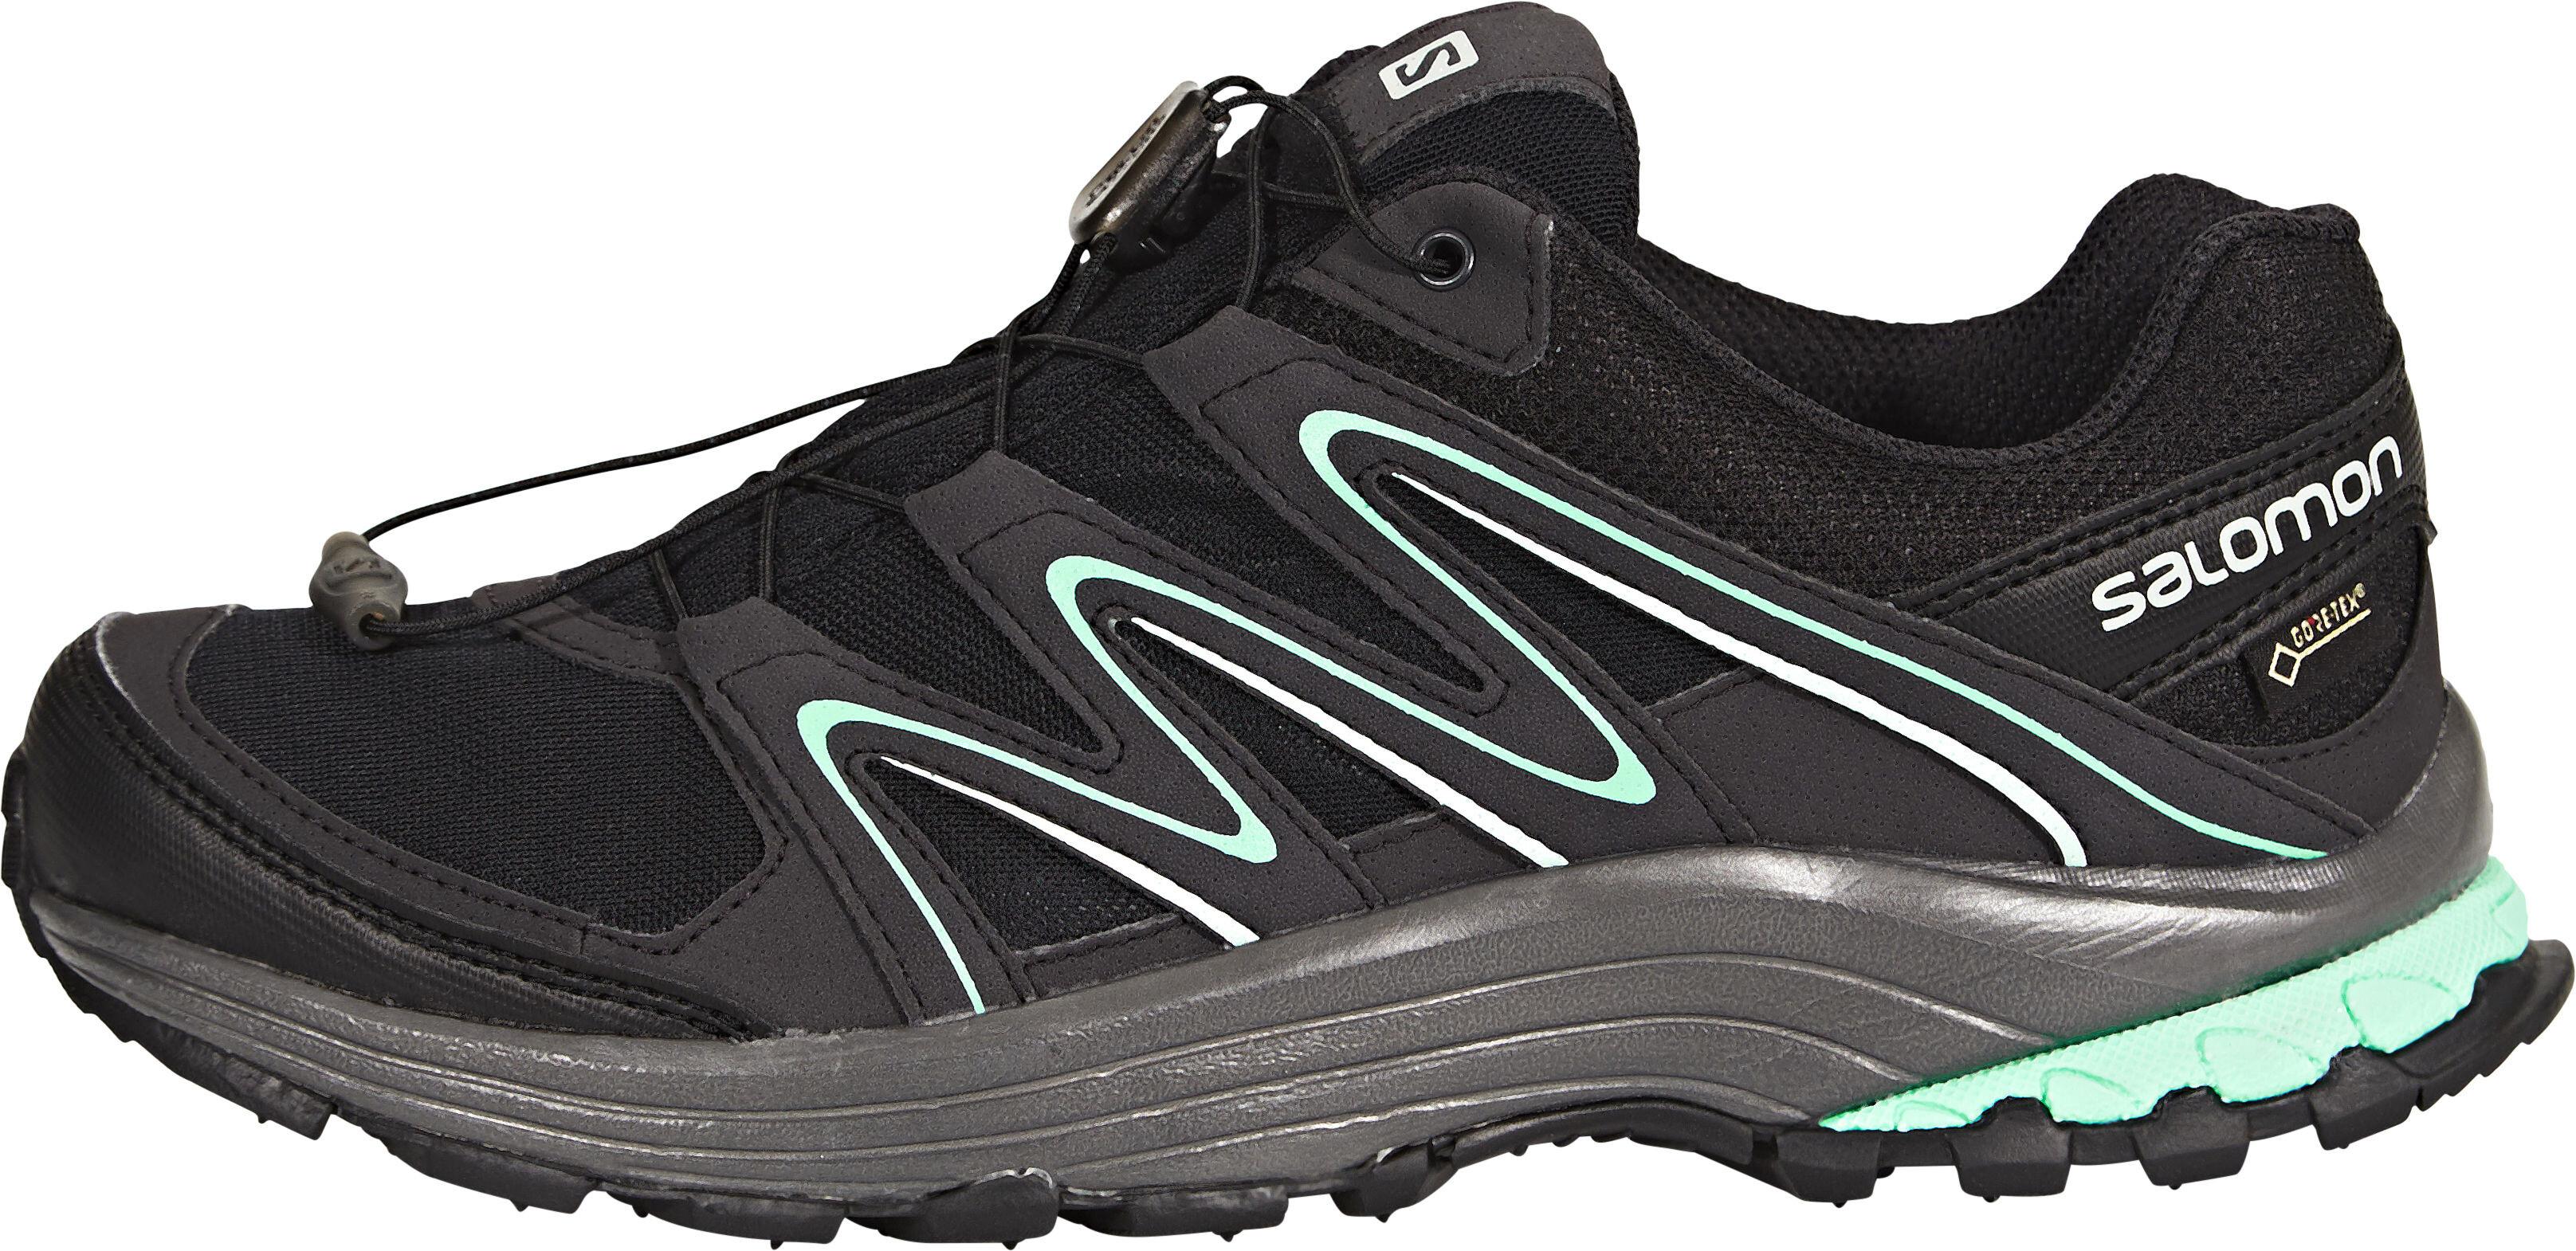 87d4caddd9eb Salomon Kiliwa GTX Shoes Women black phantom ablue